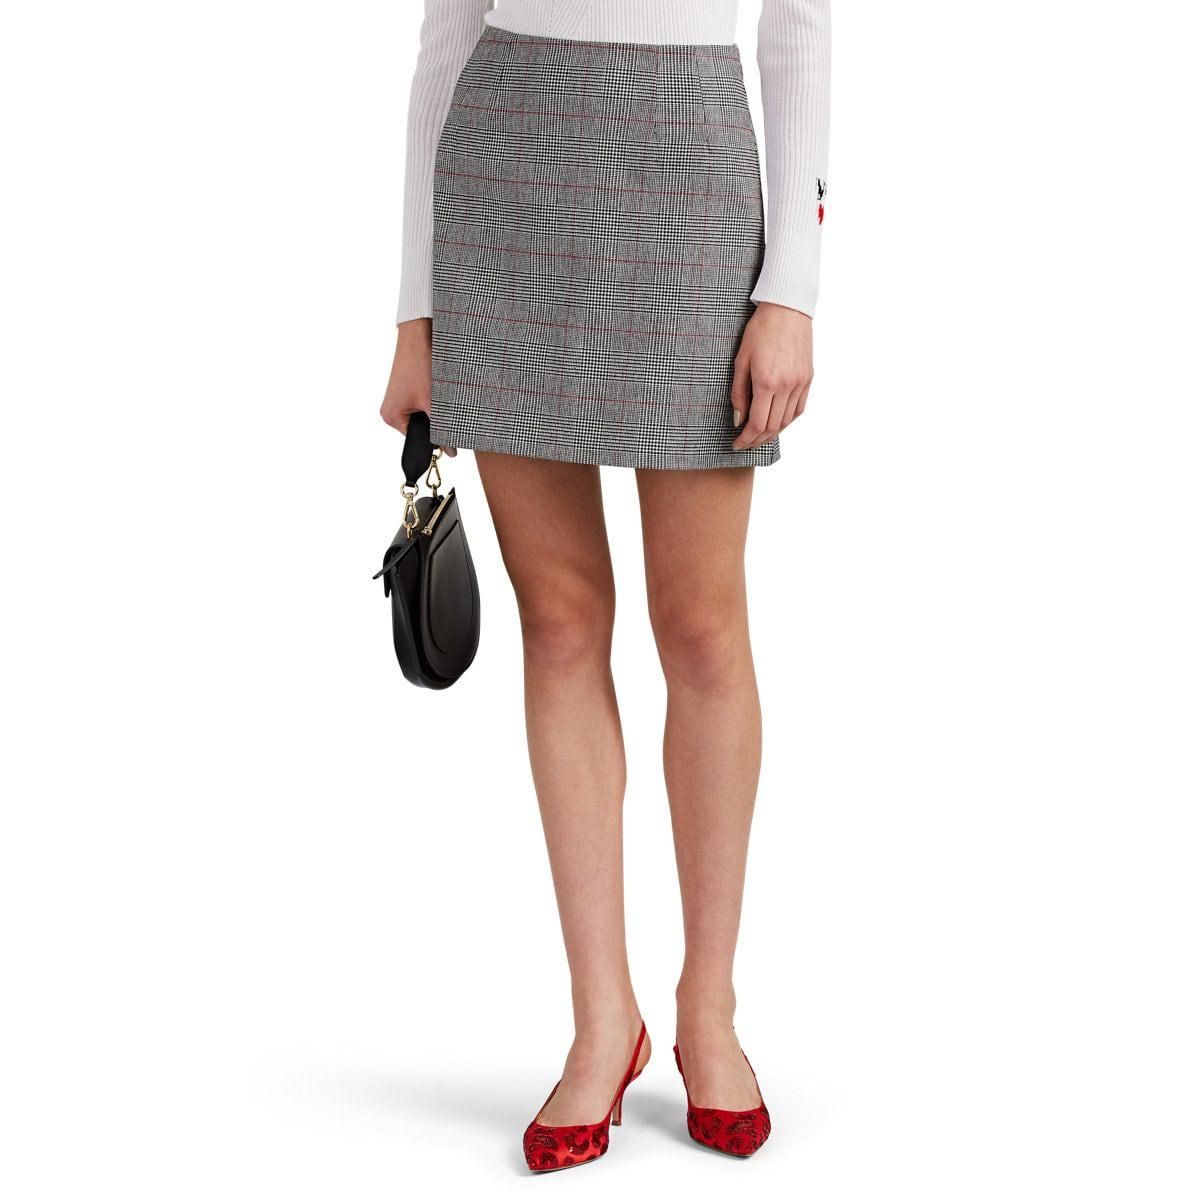 c4c7cd2c4d Vivetta Yeames Metallic Checked Miniskirt in Gray - Lyst